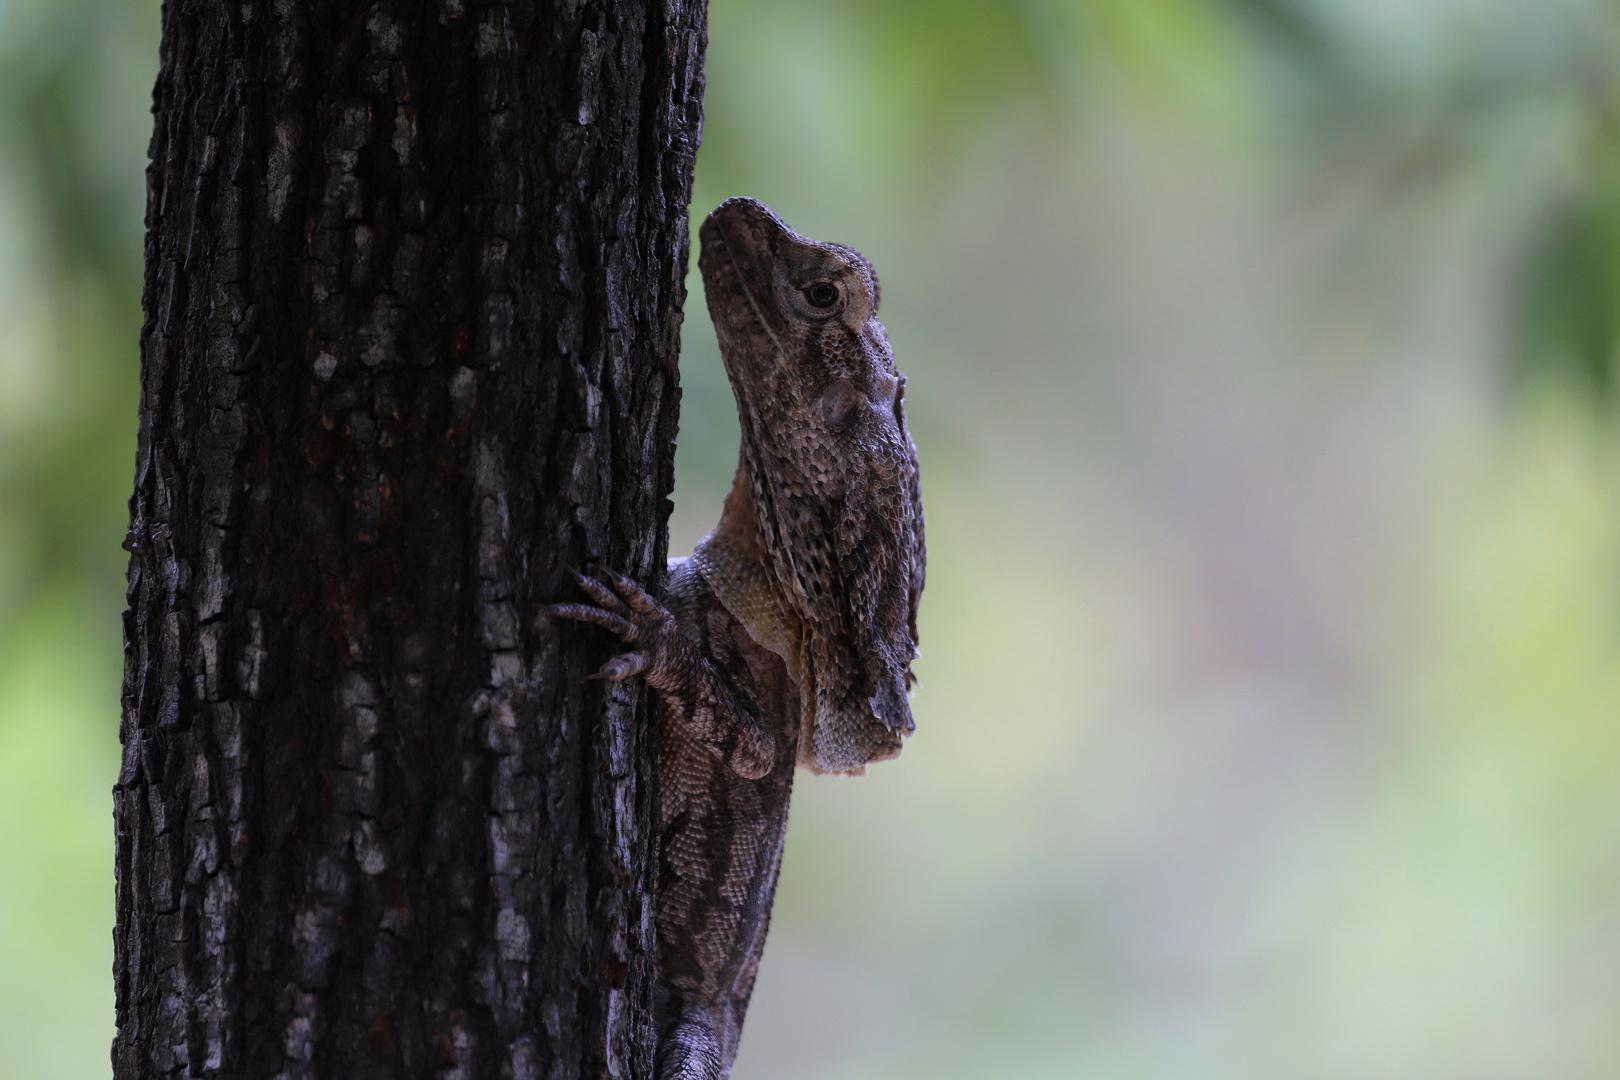 frillneck lizard